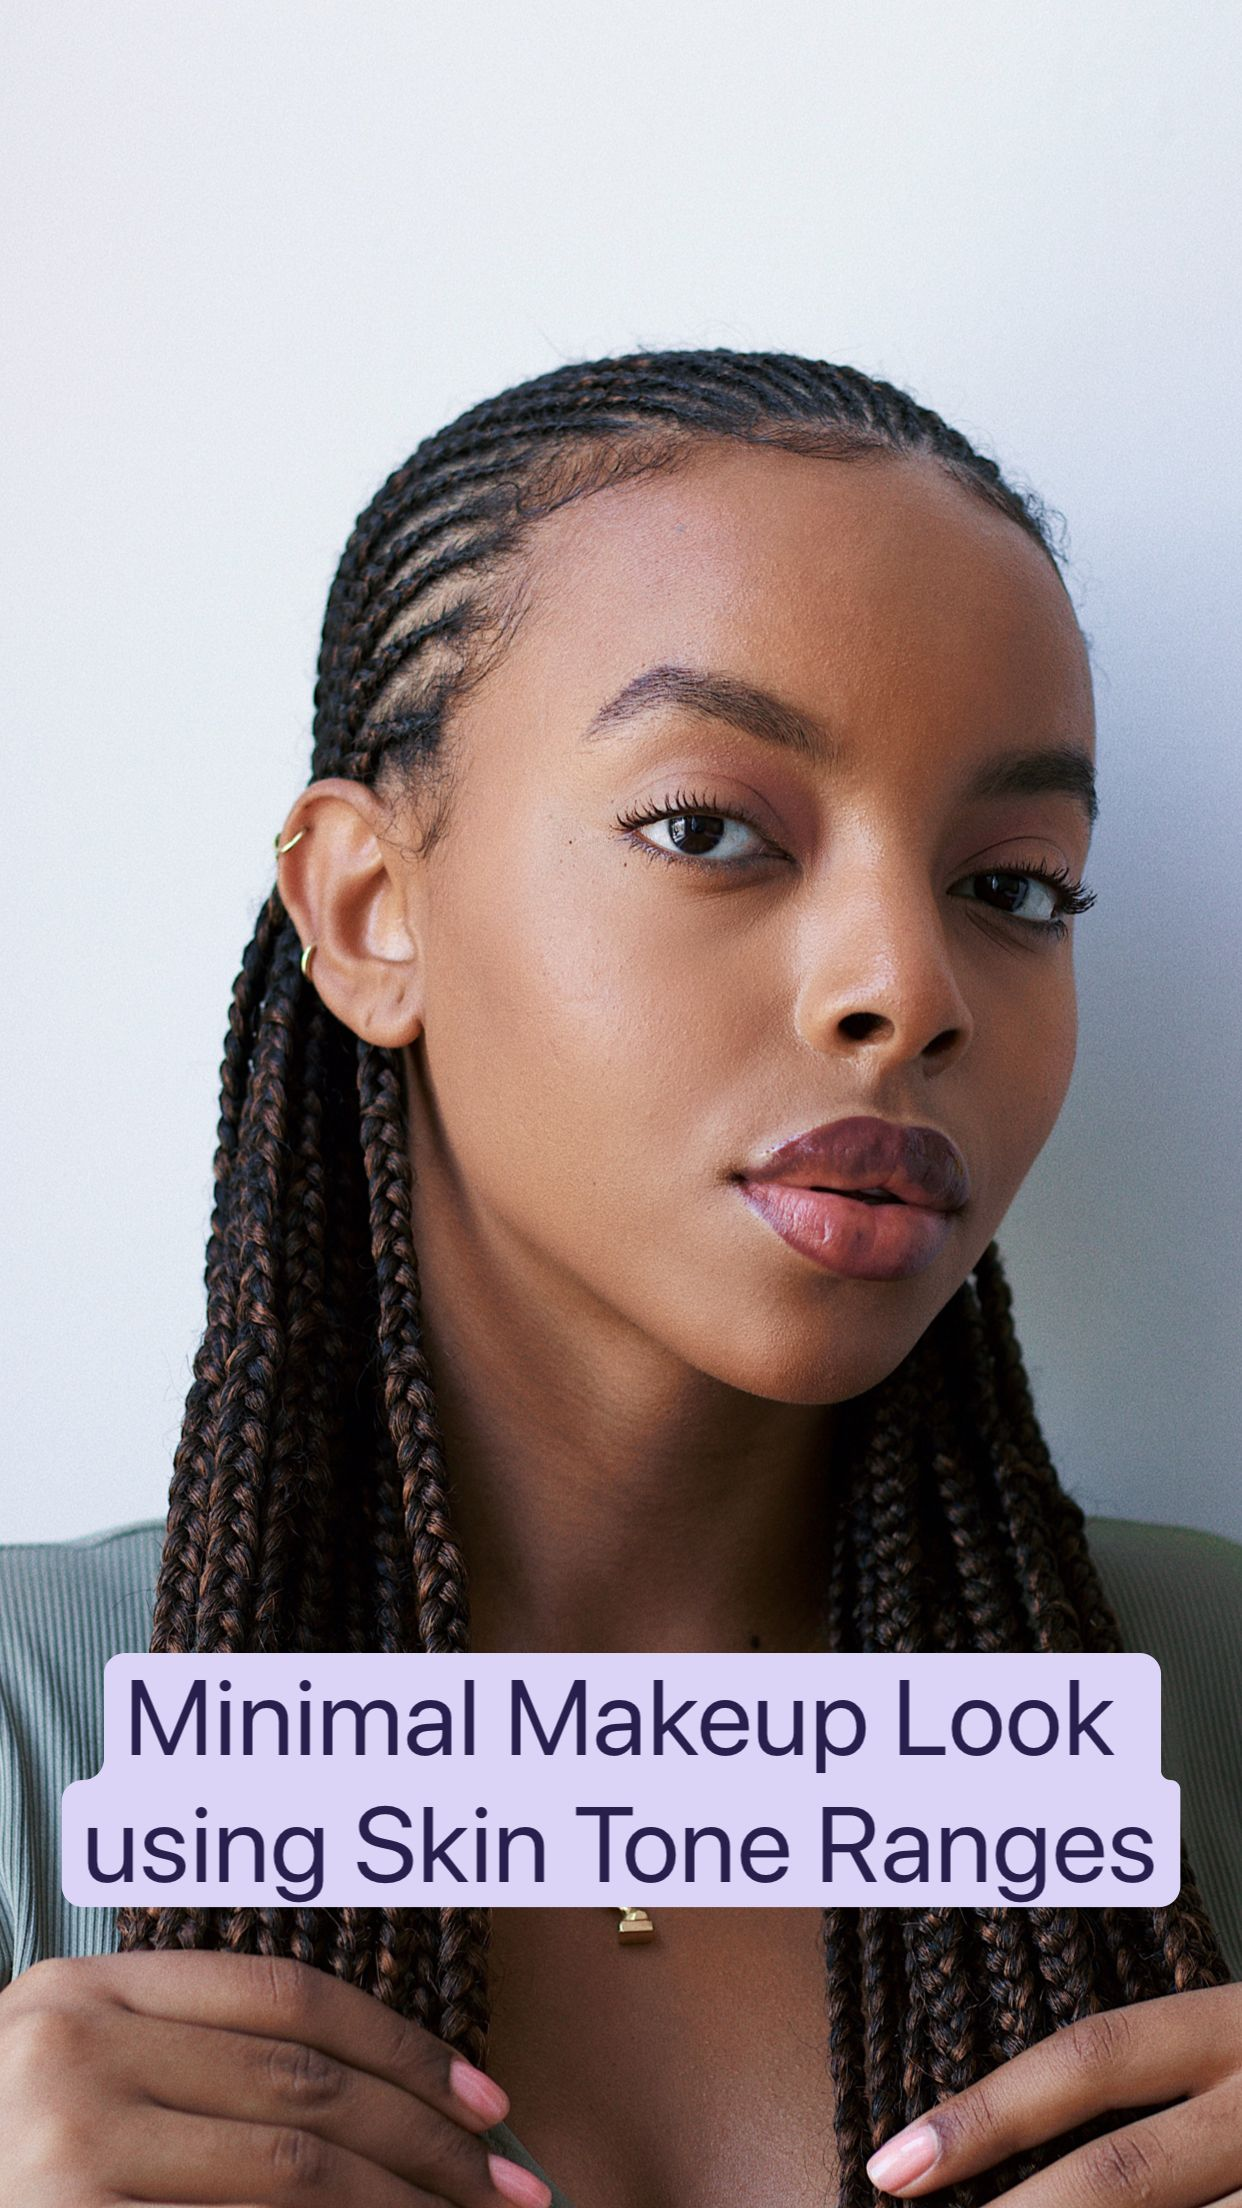 How To Use Skin Tone Ranges: Minimal Makeup Look